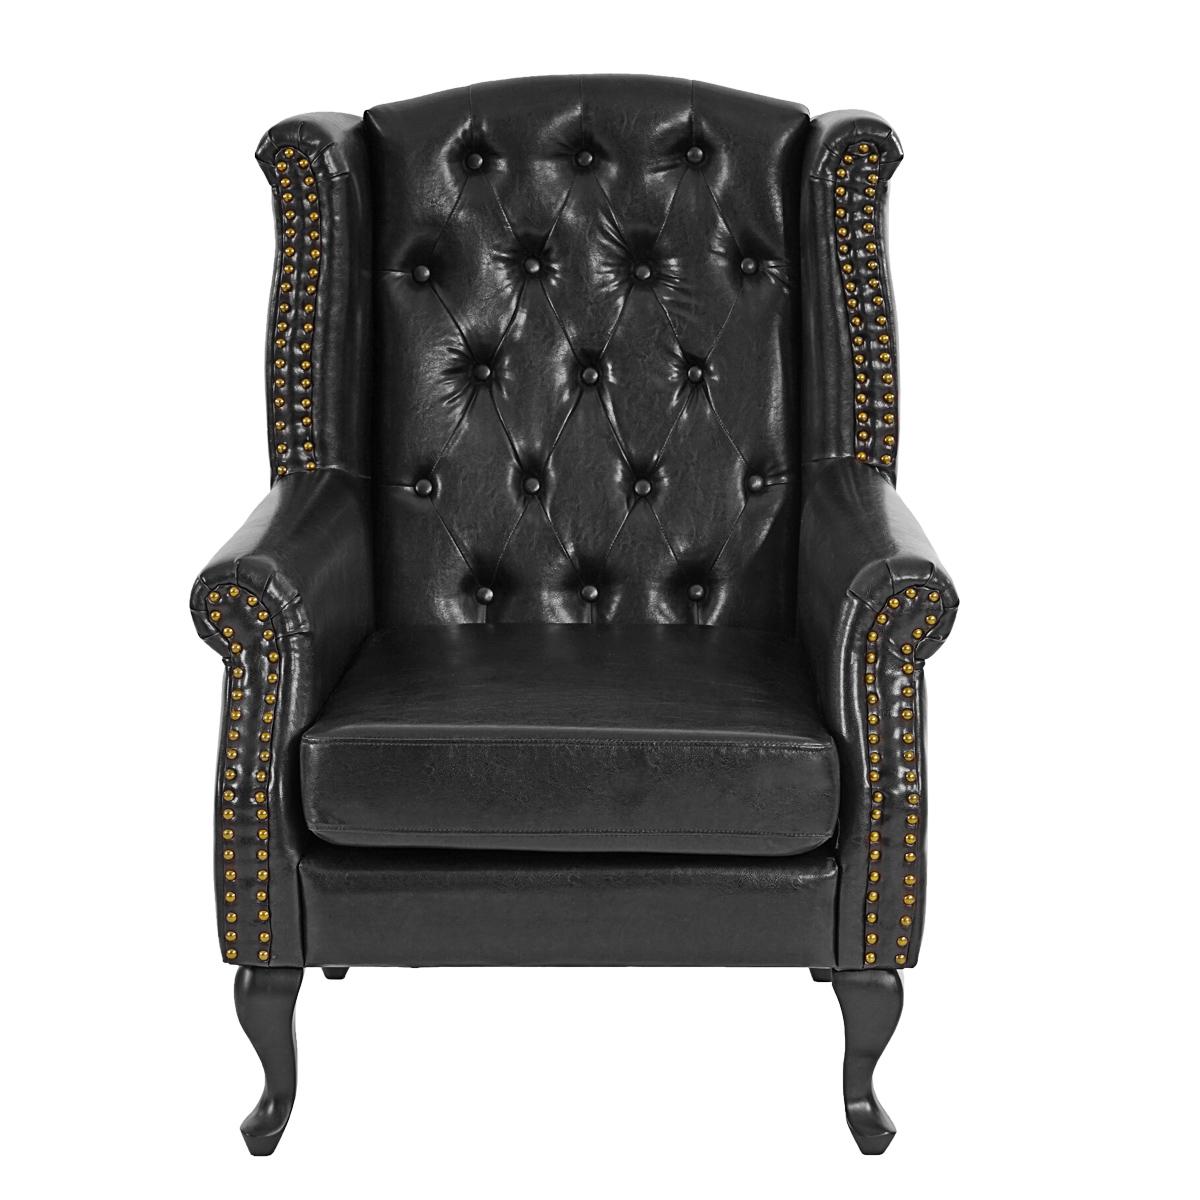 sessel relaxsessel clubsessel ohrensessel chesterfield kunstleder schwarz ohne ottomane. Black Bedroom Furniture Sets. Home Design Ideas